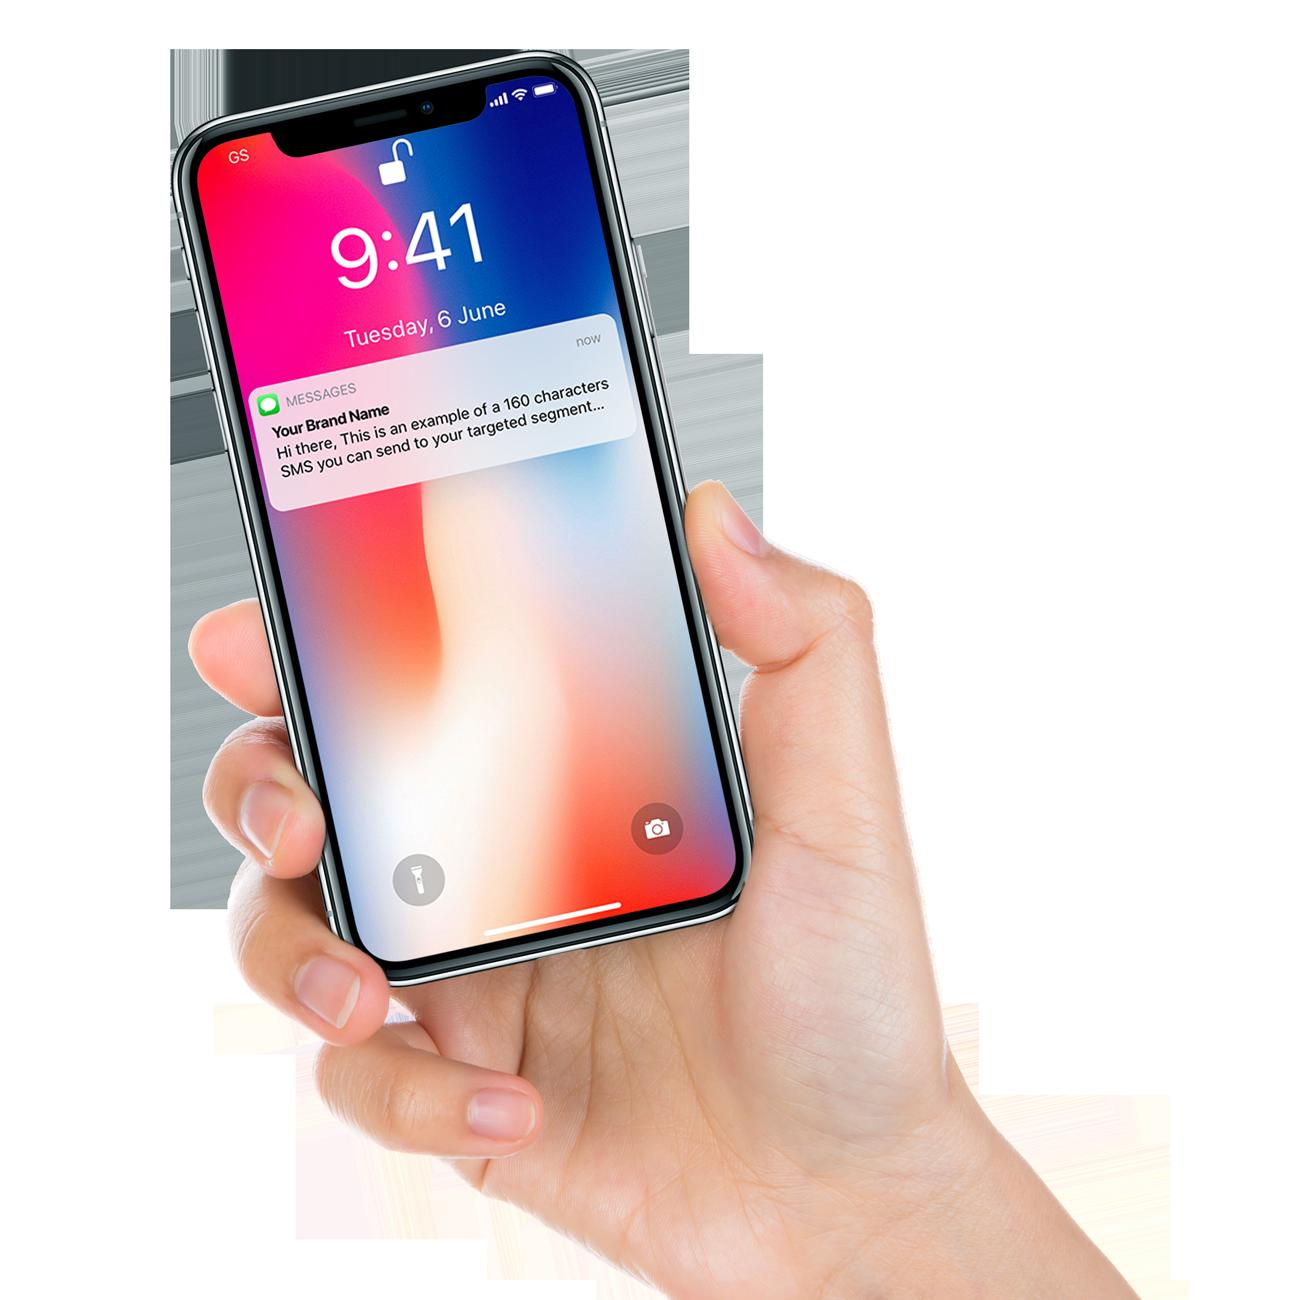 sms-phone-mockup-1.png